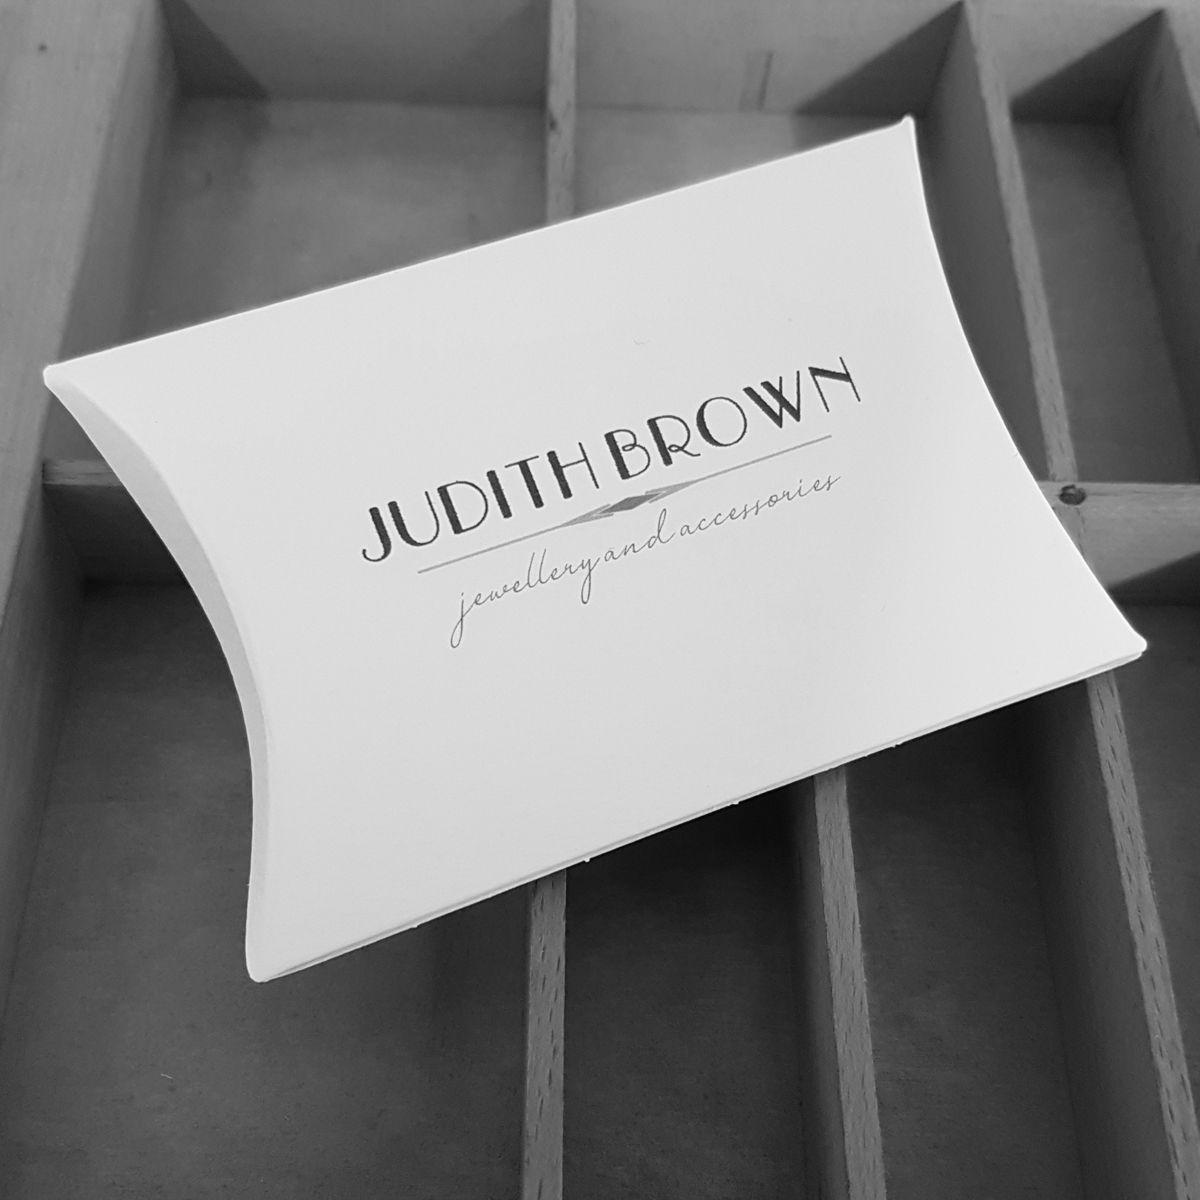 Gift box Judith Brown Jewellery